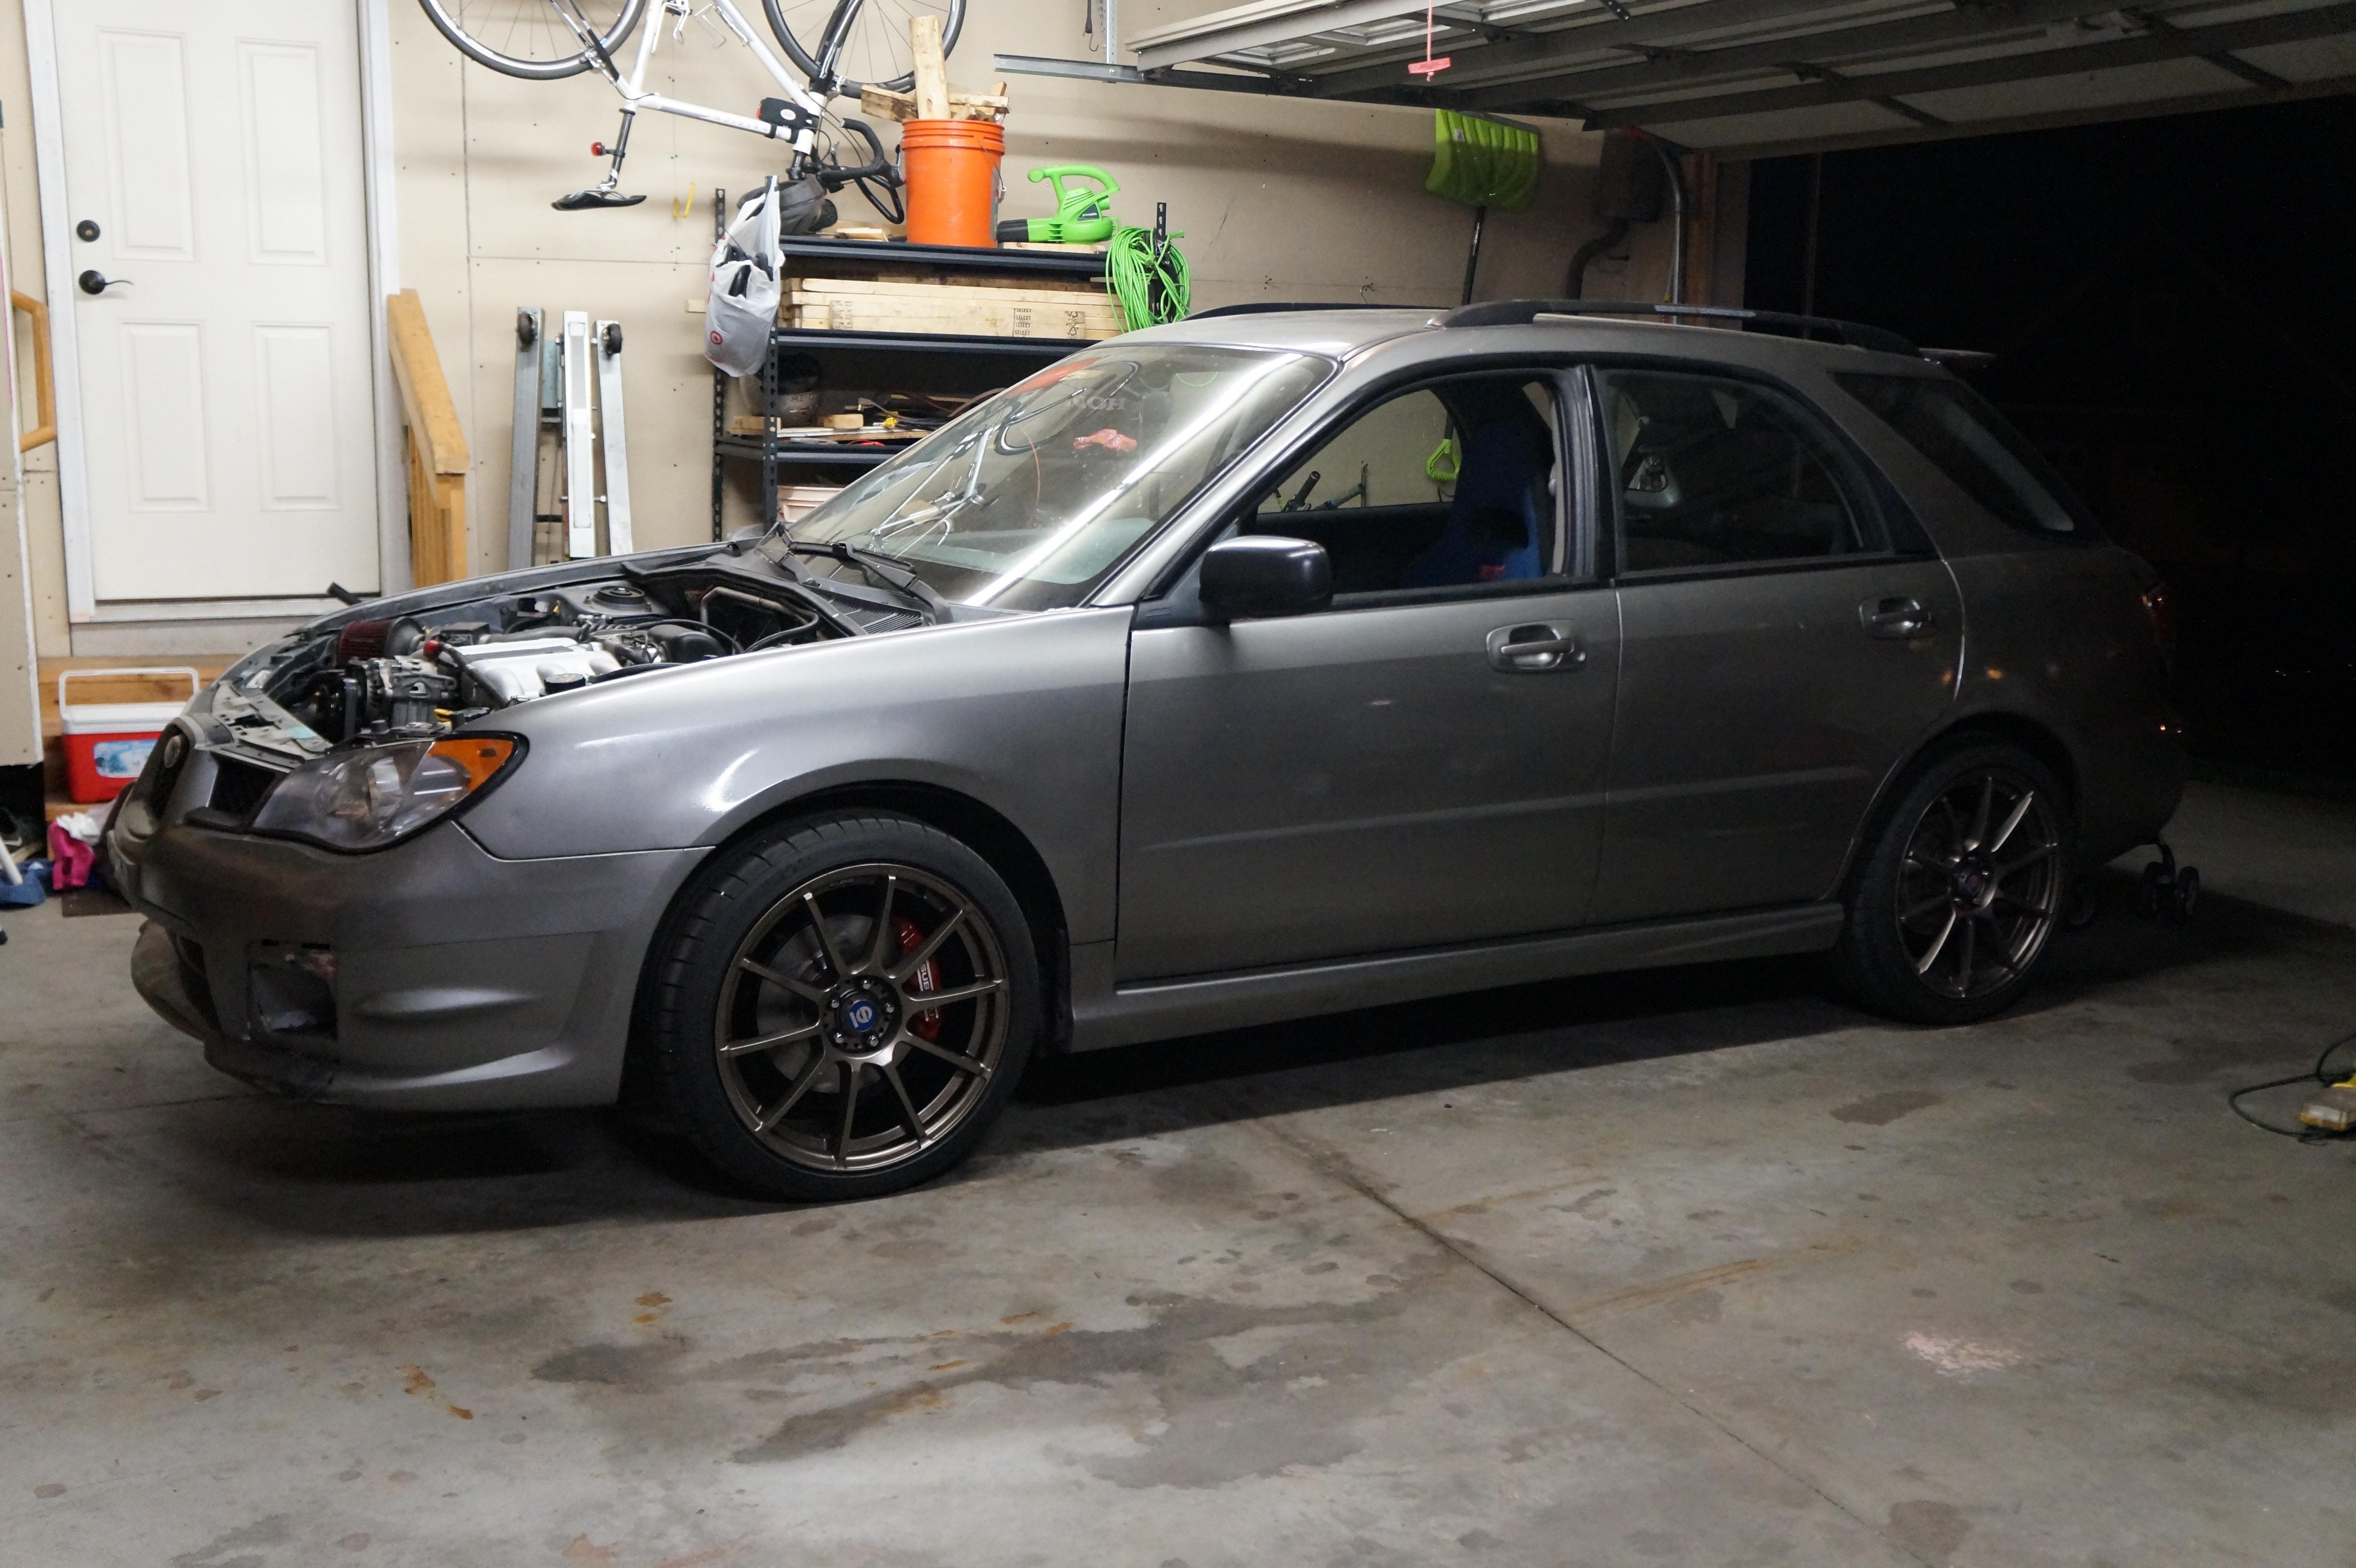 2004 Subaru Impreza 2.5 Wagon Coil Pack Wiring Diagram